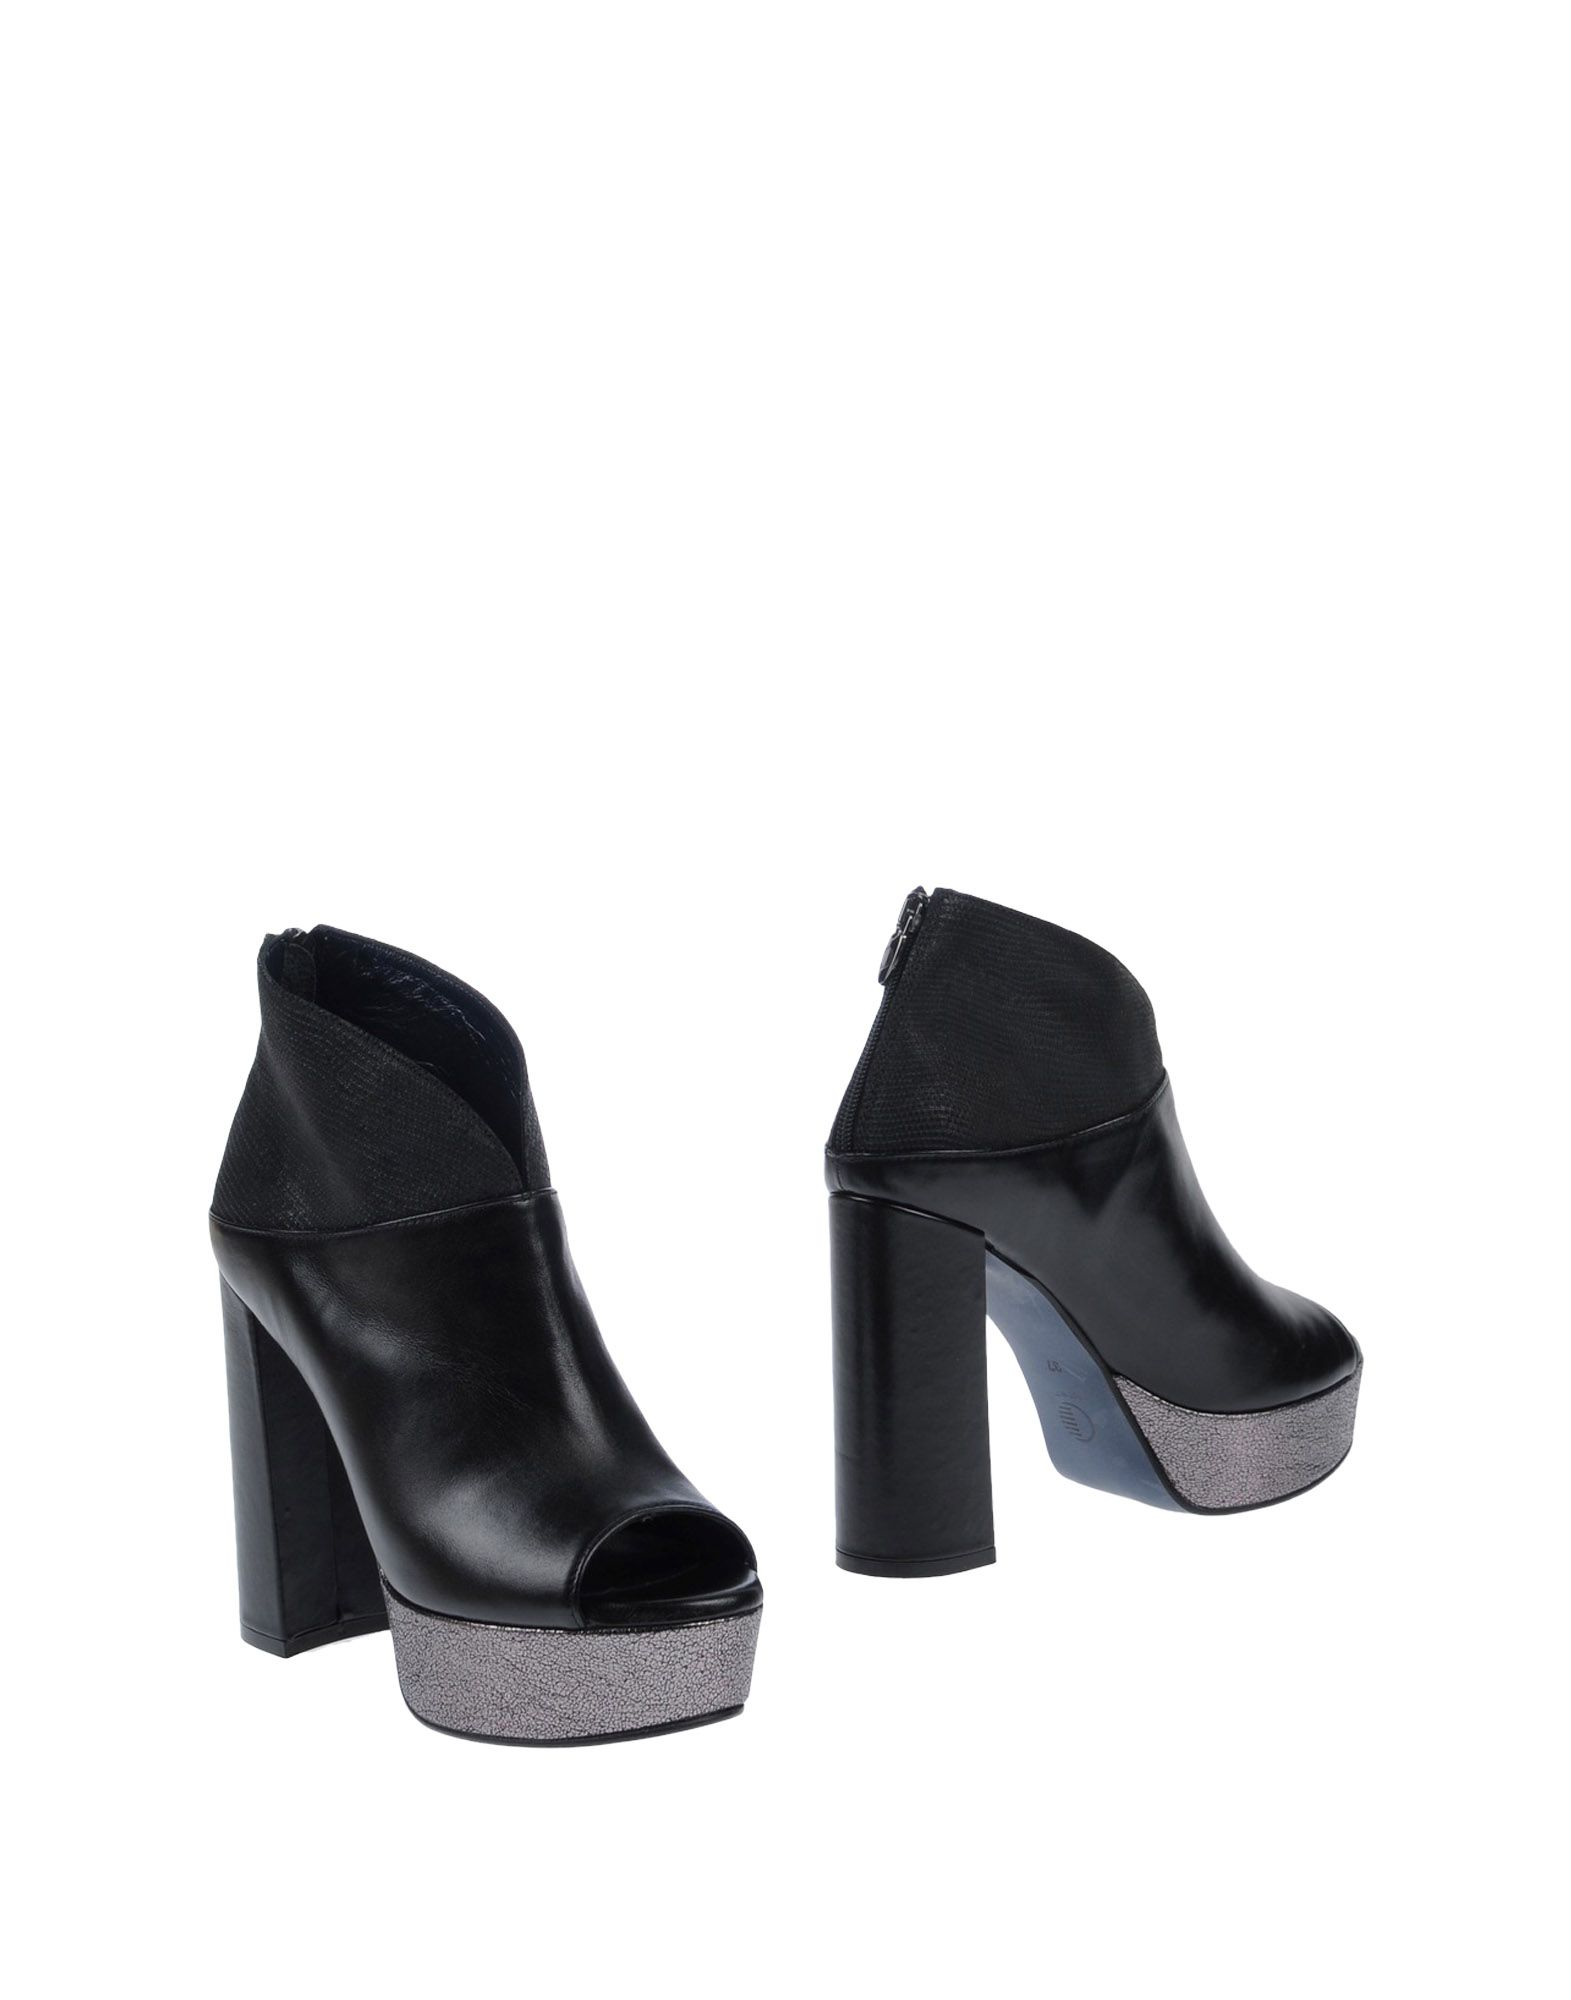 Andrea Pinto Stiefelette Damen  11506397ECGut aussehende strapazierfähige Schuhe